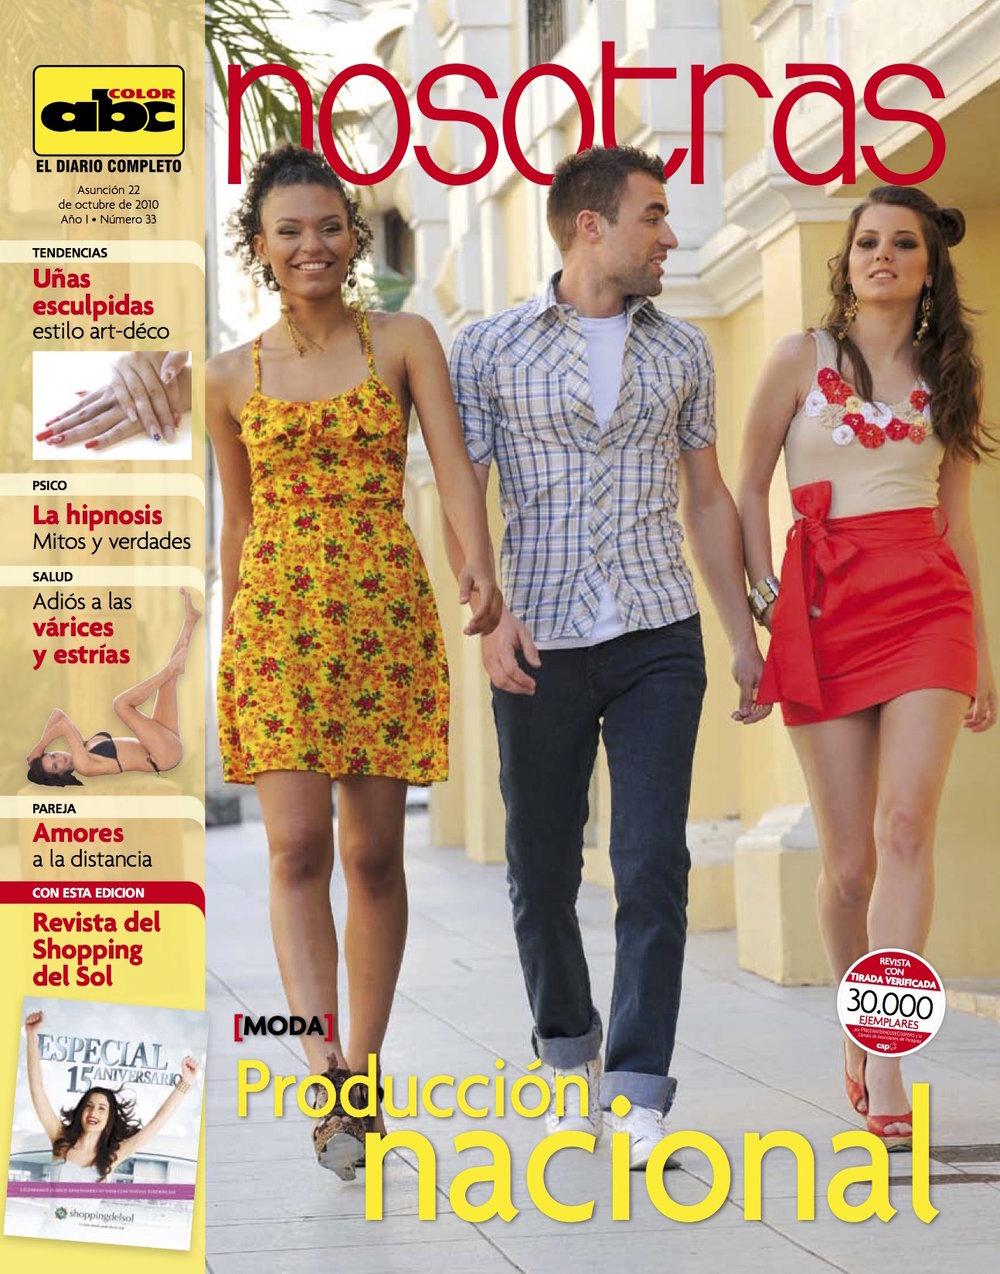 ABC_NOSOTRAS_22oct_paraguay Portada.jpg